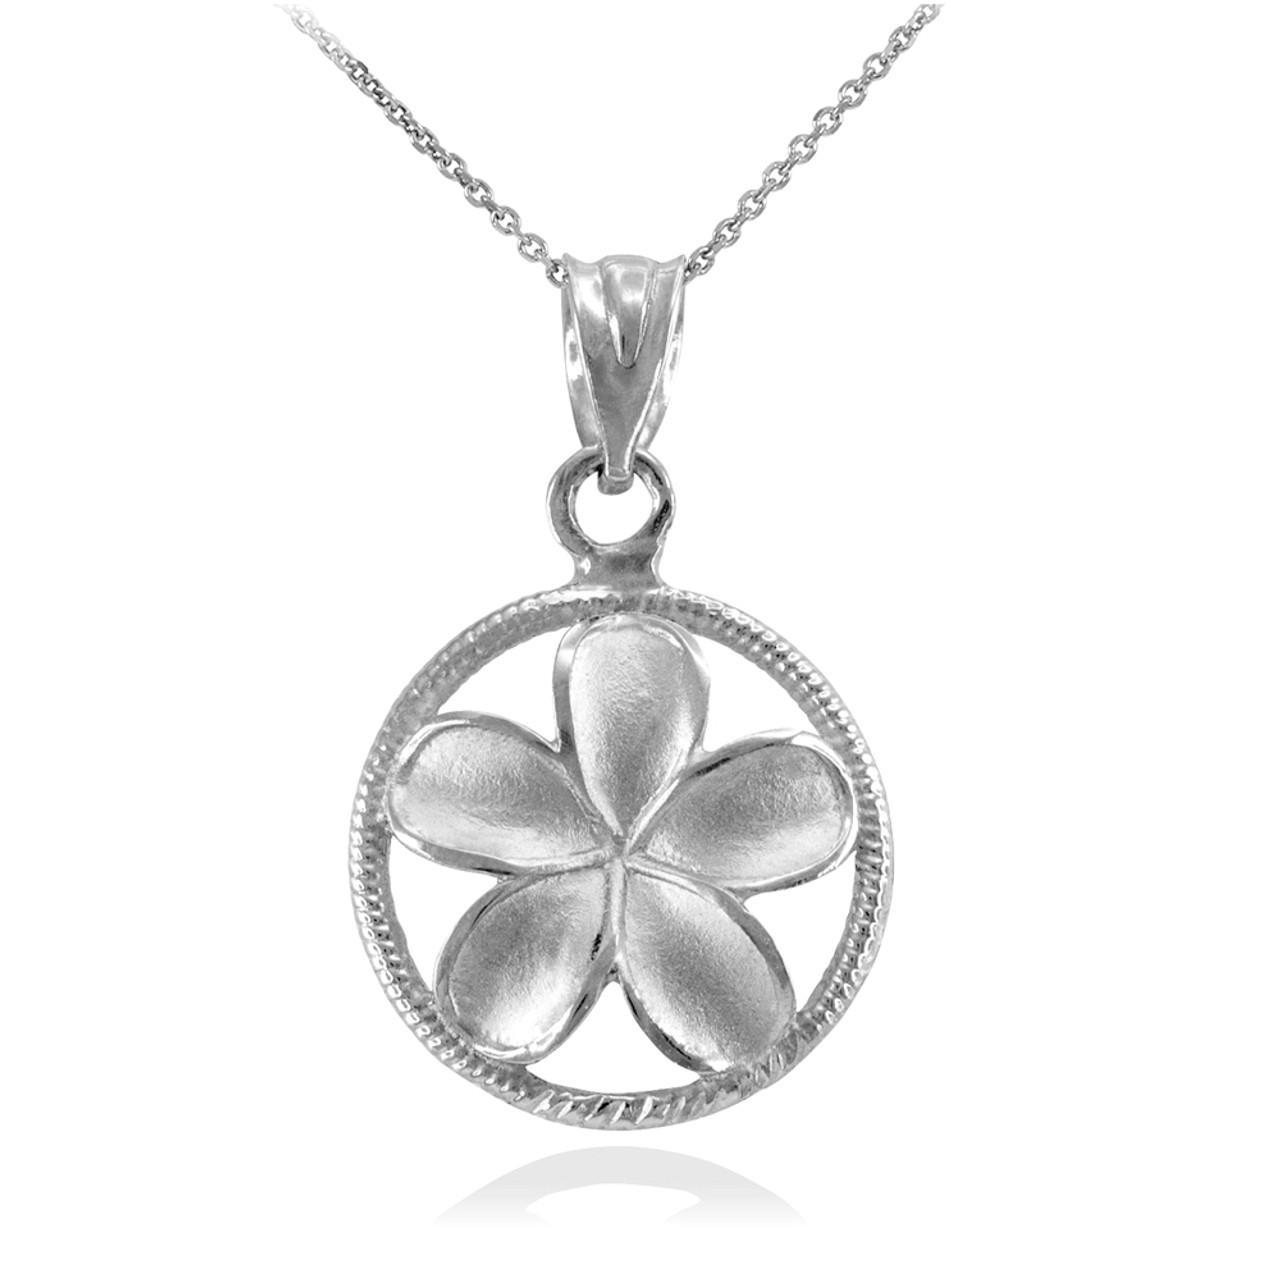 925 Sterling Silver Polished Plumeria Flower Charm Pendant